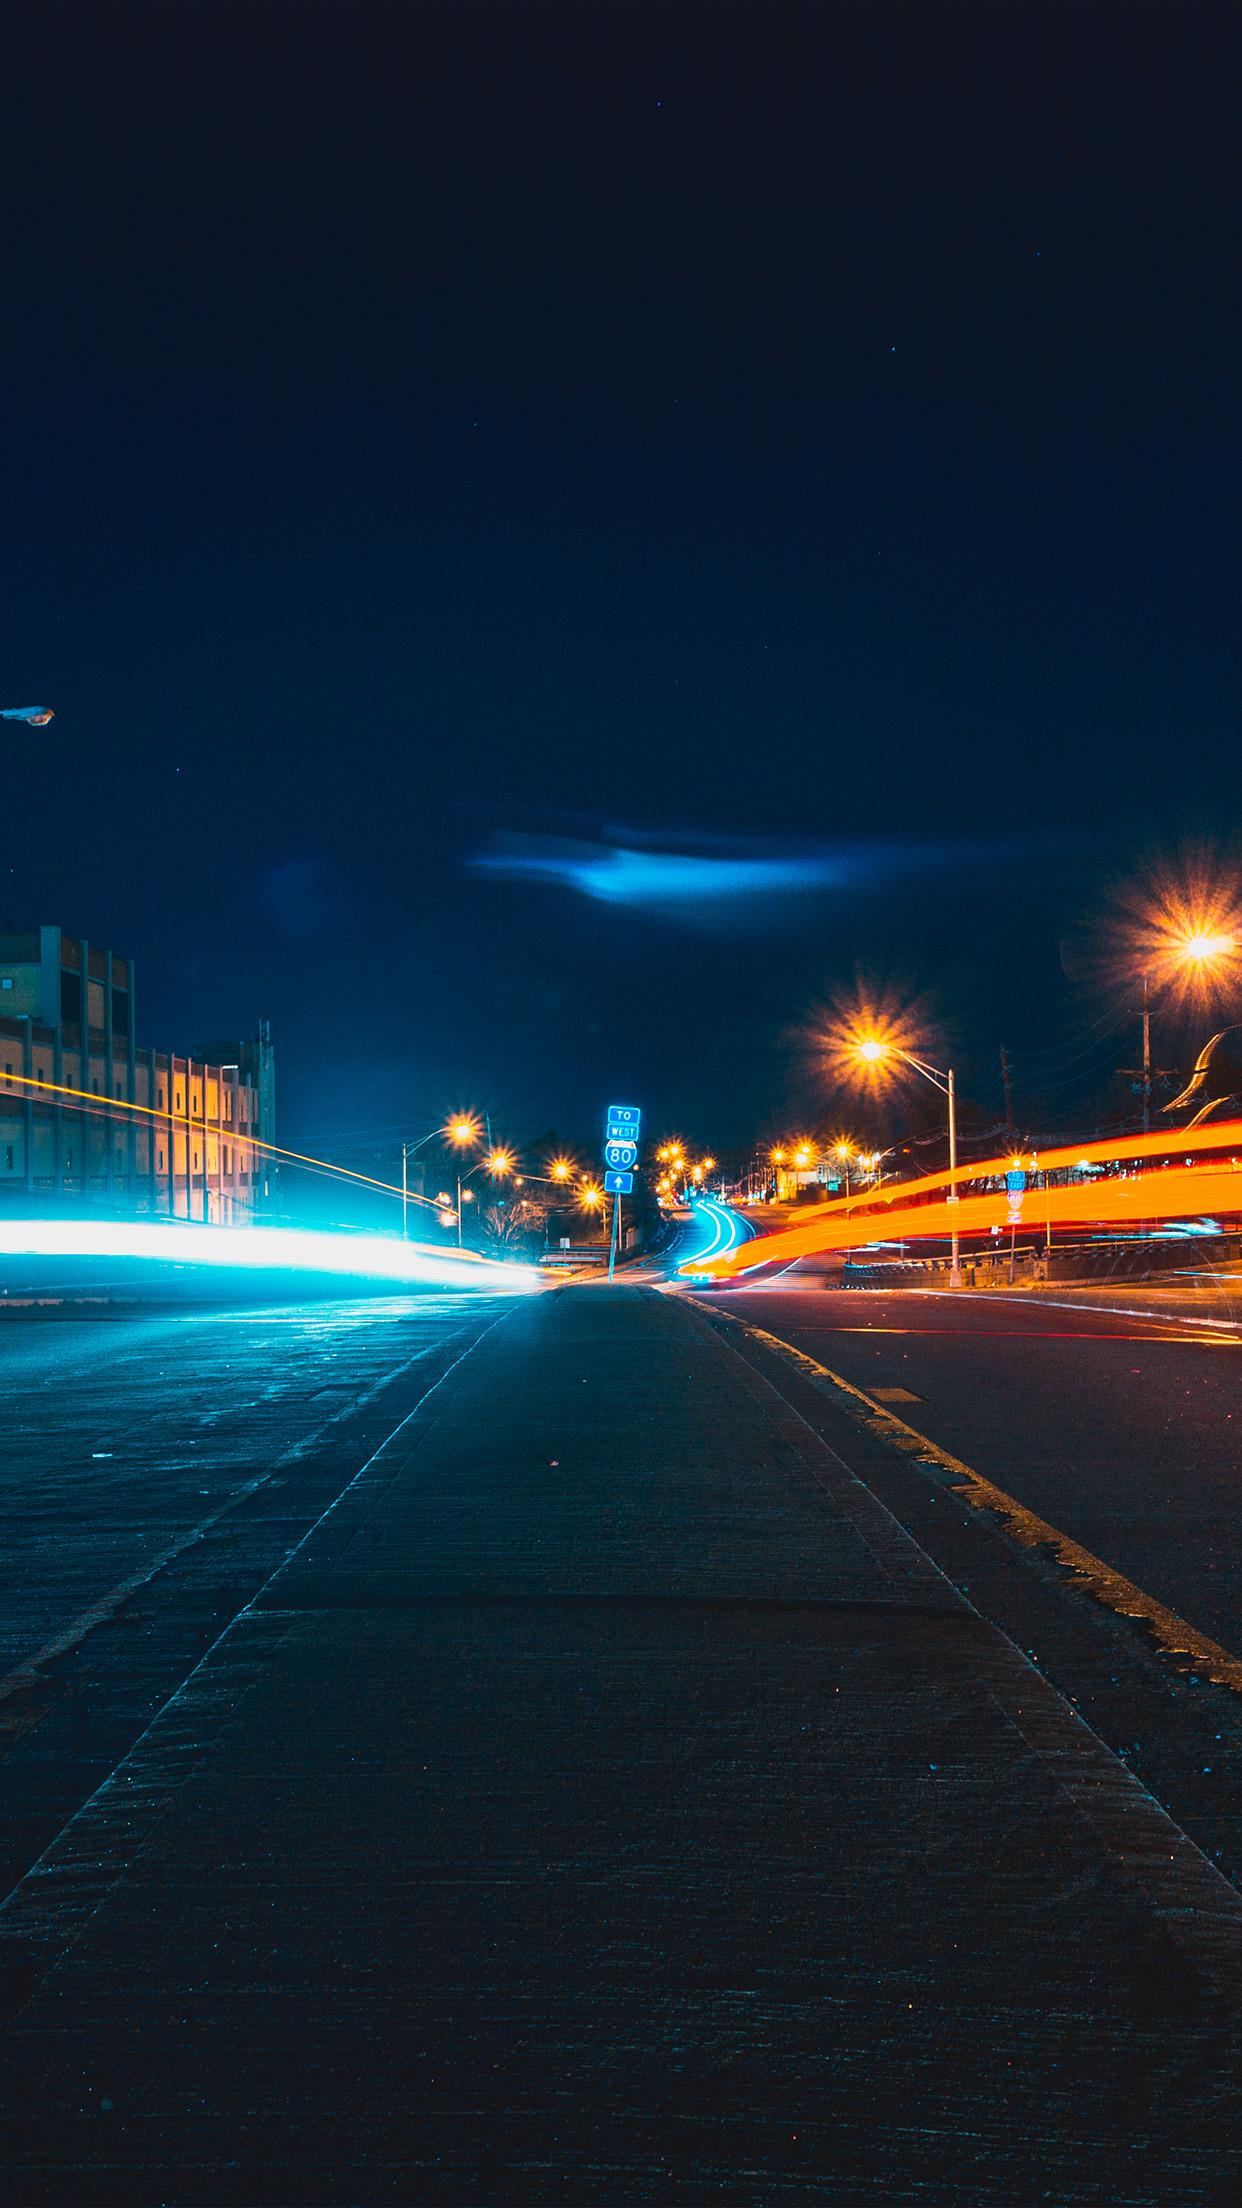 Nq57 street light night city nature wallpaper - Night light hd wallpaper ...